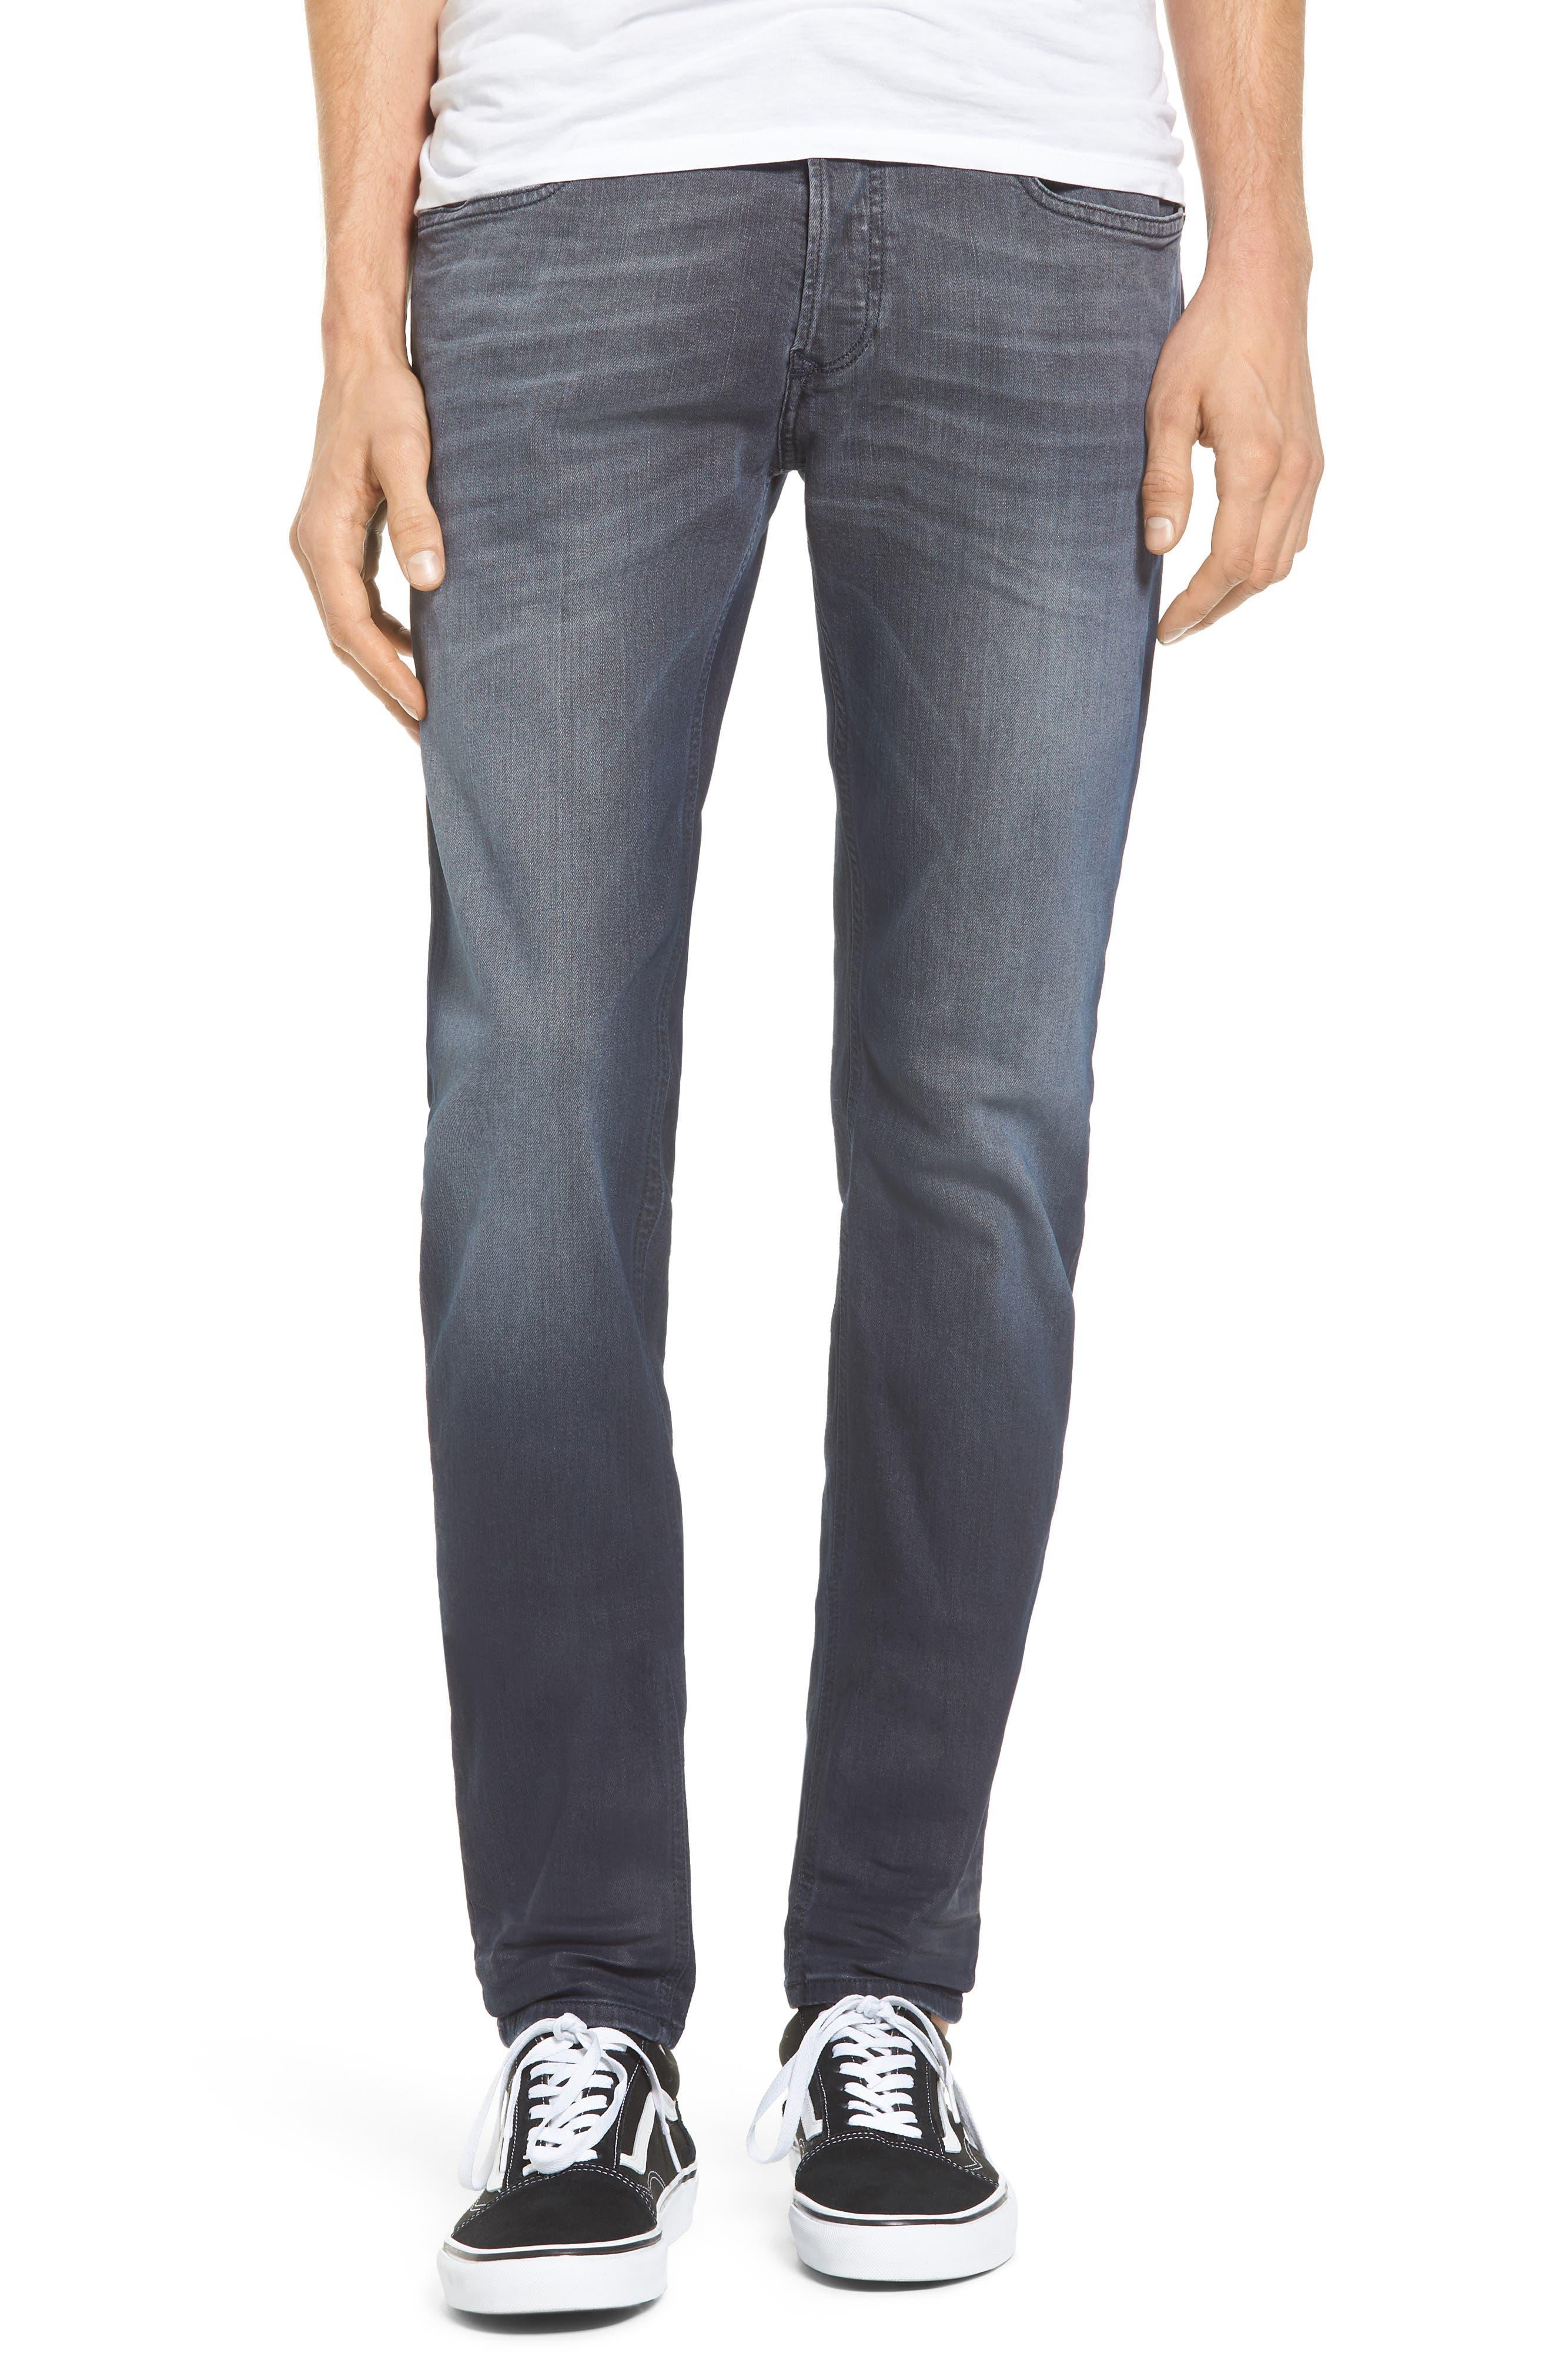 Sleenker Skinny Fit Jeans,                         Main,                         color, 400